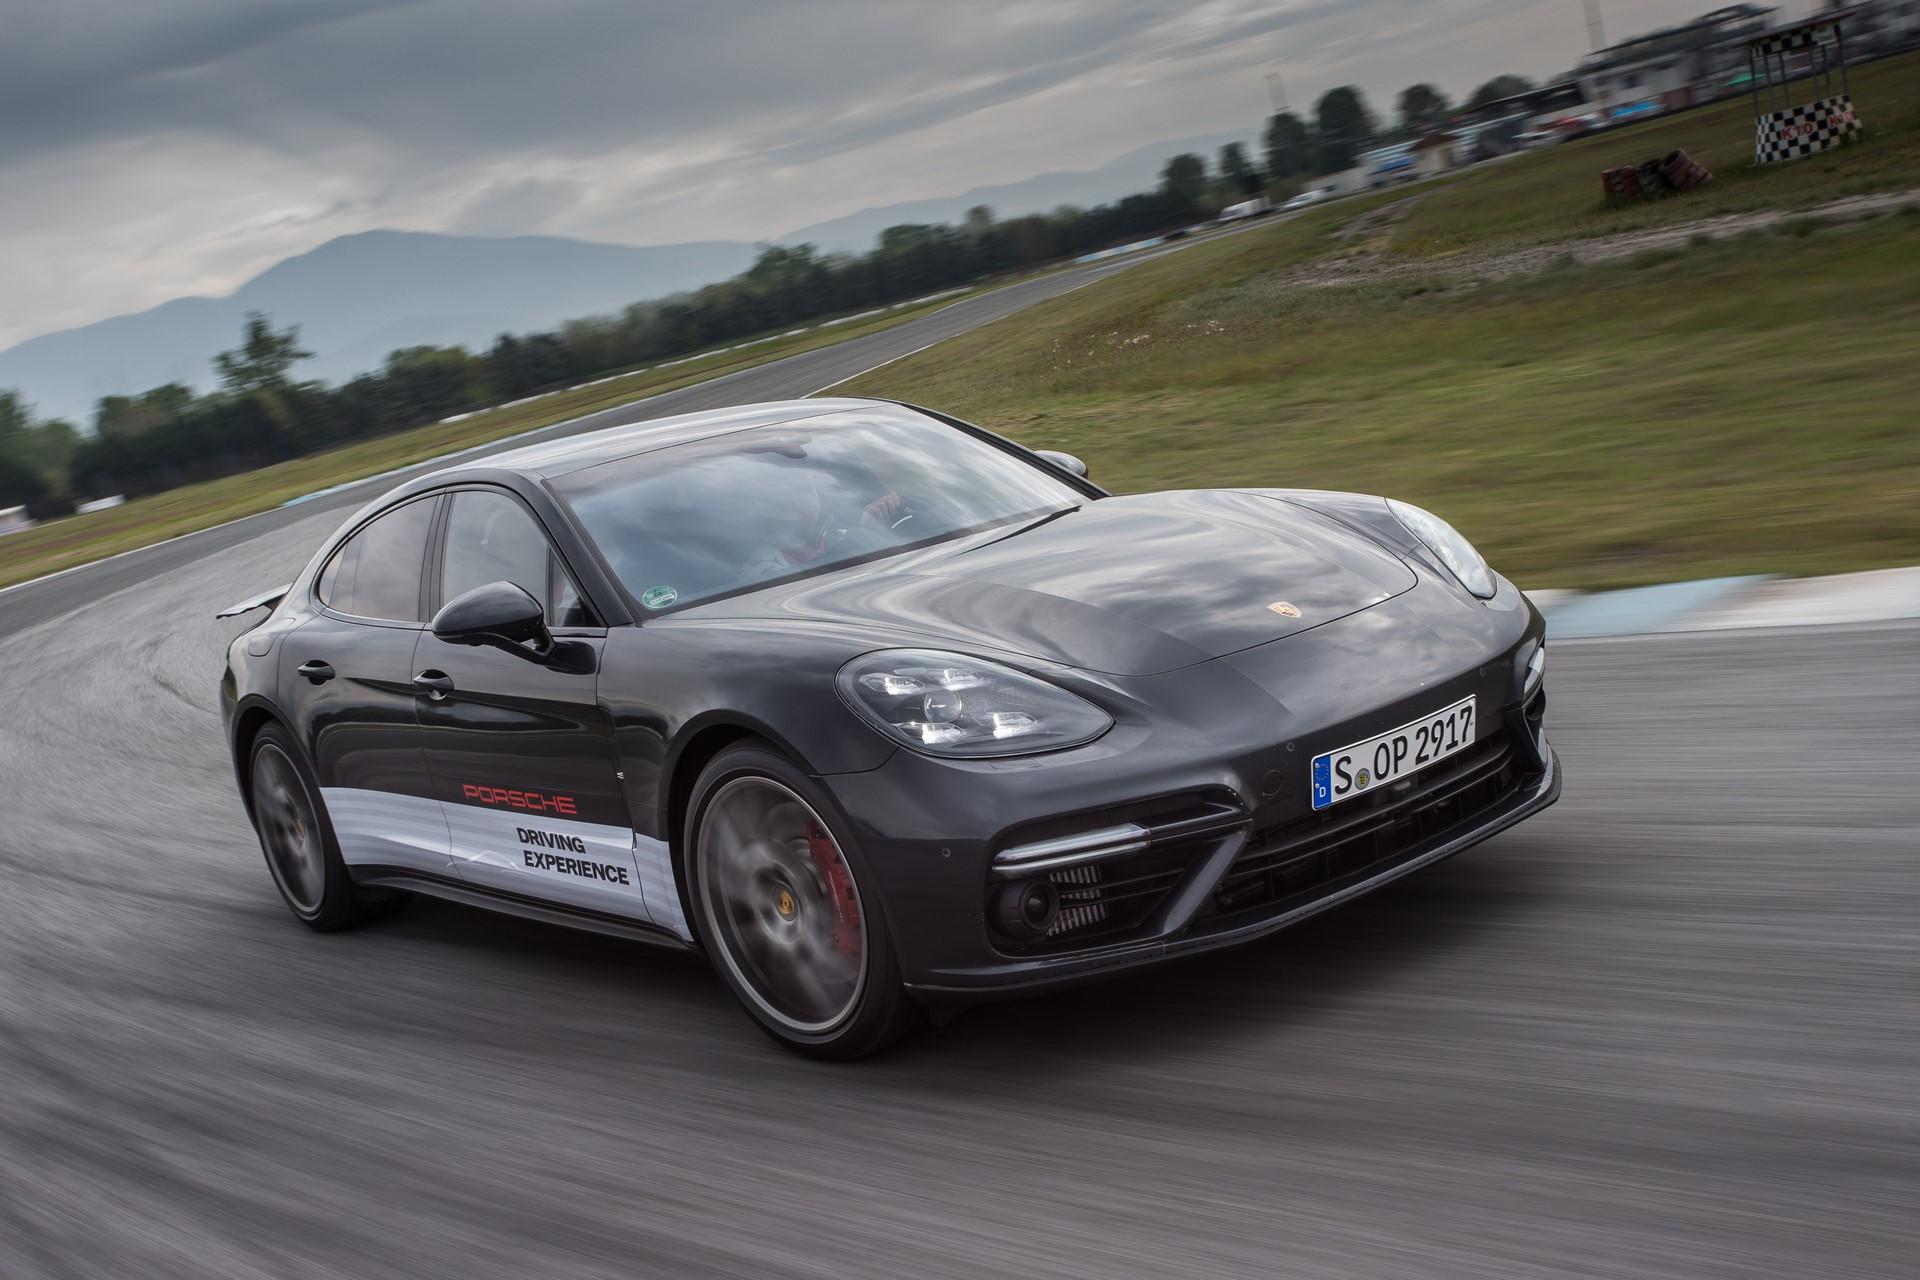 Porsche Driving Experience 2017 Serres (44)